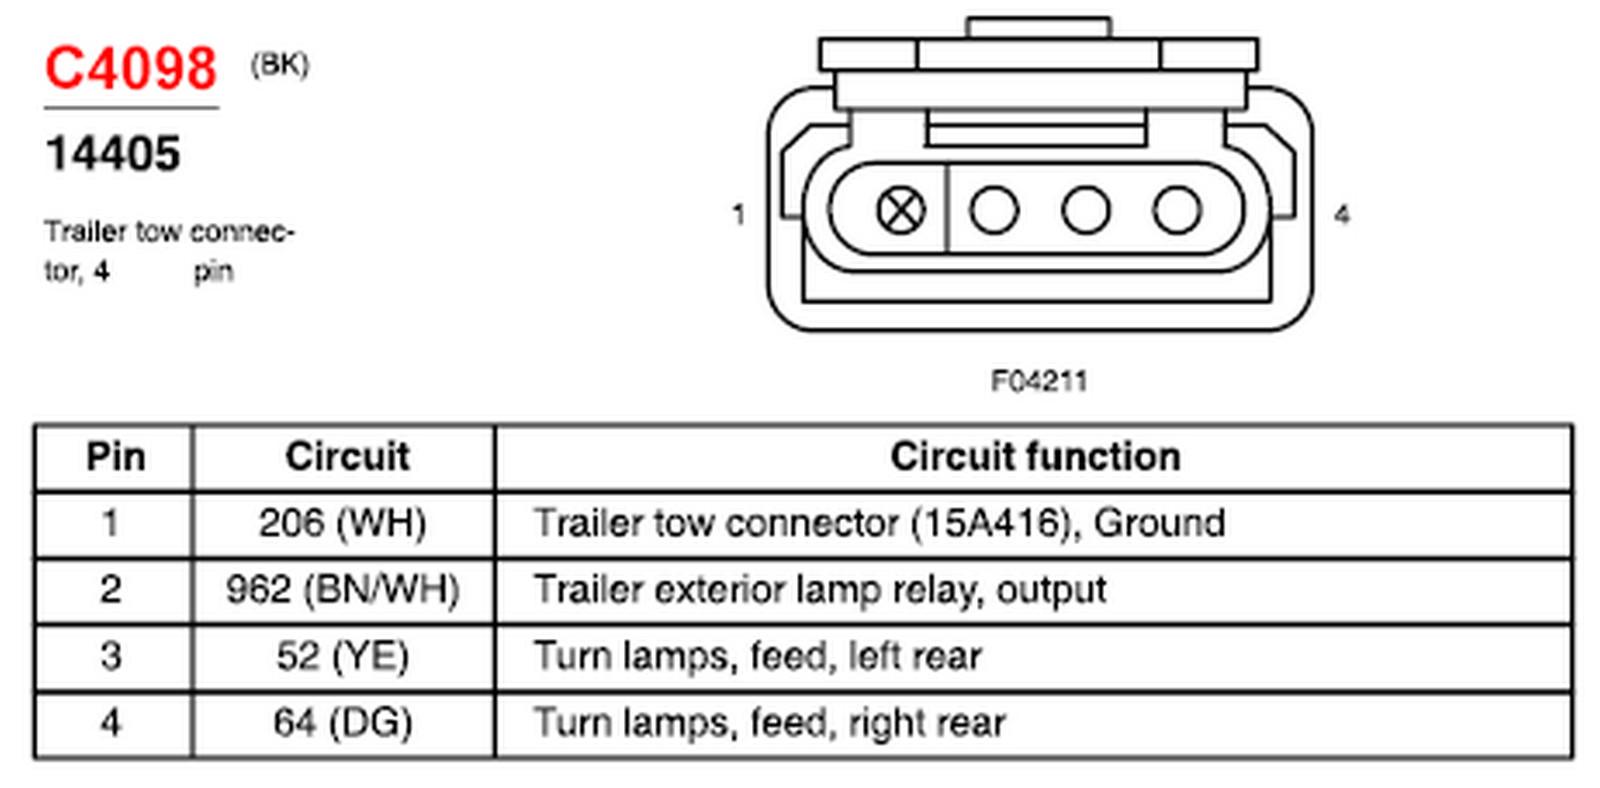 2004 nissan frontier fuse box diagram 2004 nissan frontier alternator  wiring nissan frontier fuse nissan frontier